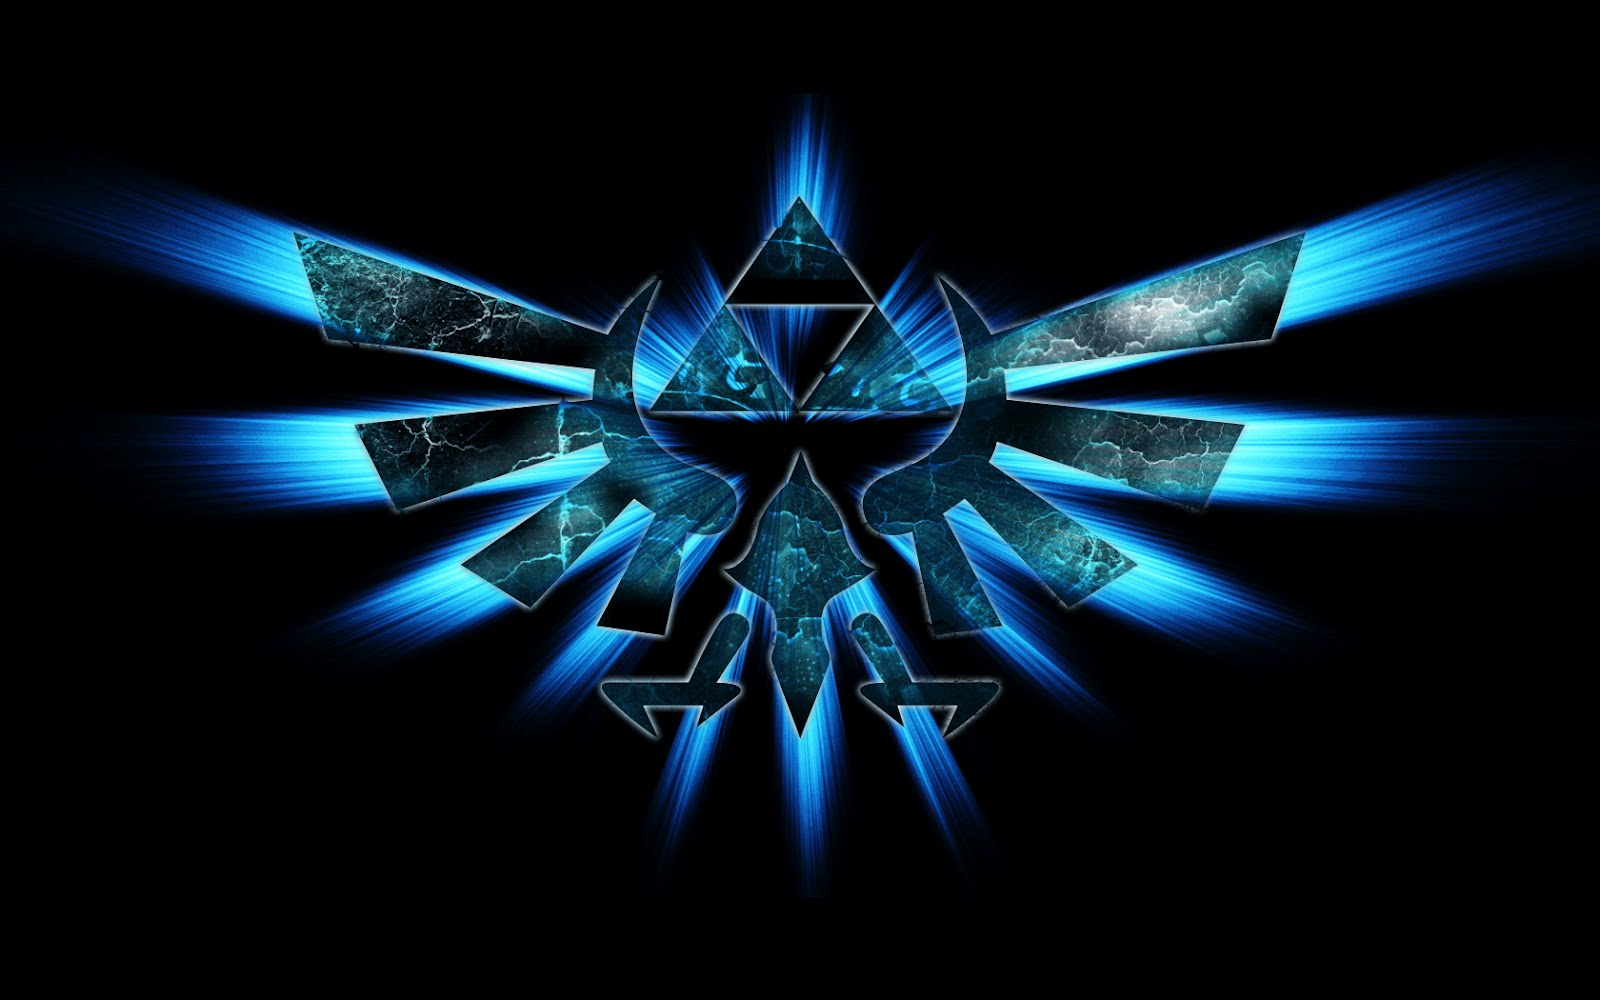 Blue Phoenix Wallpaper